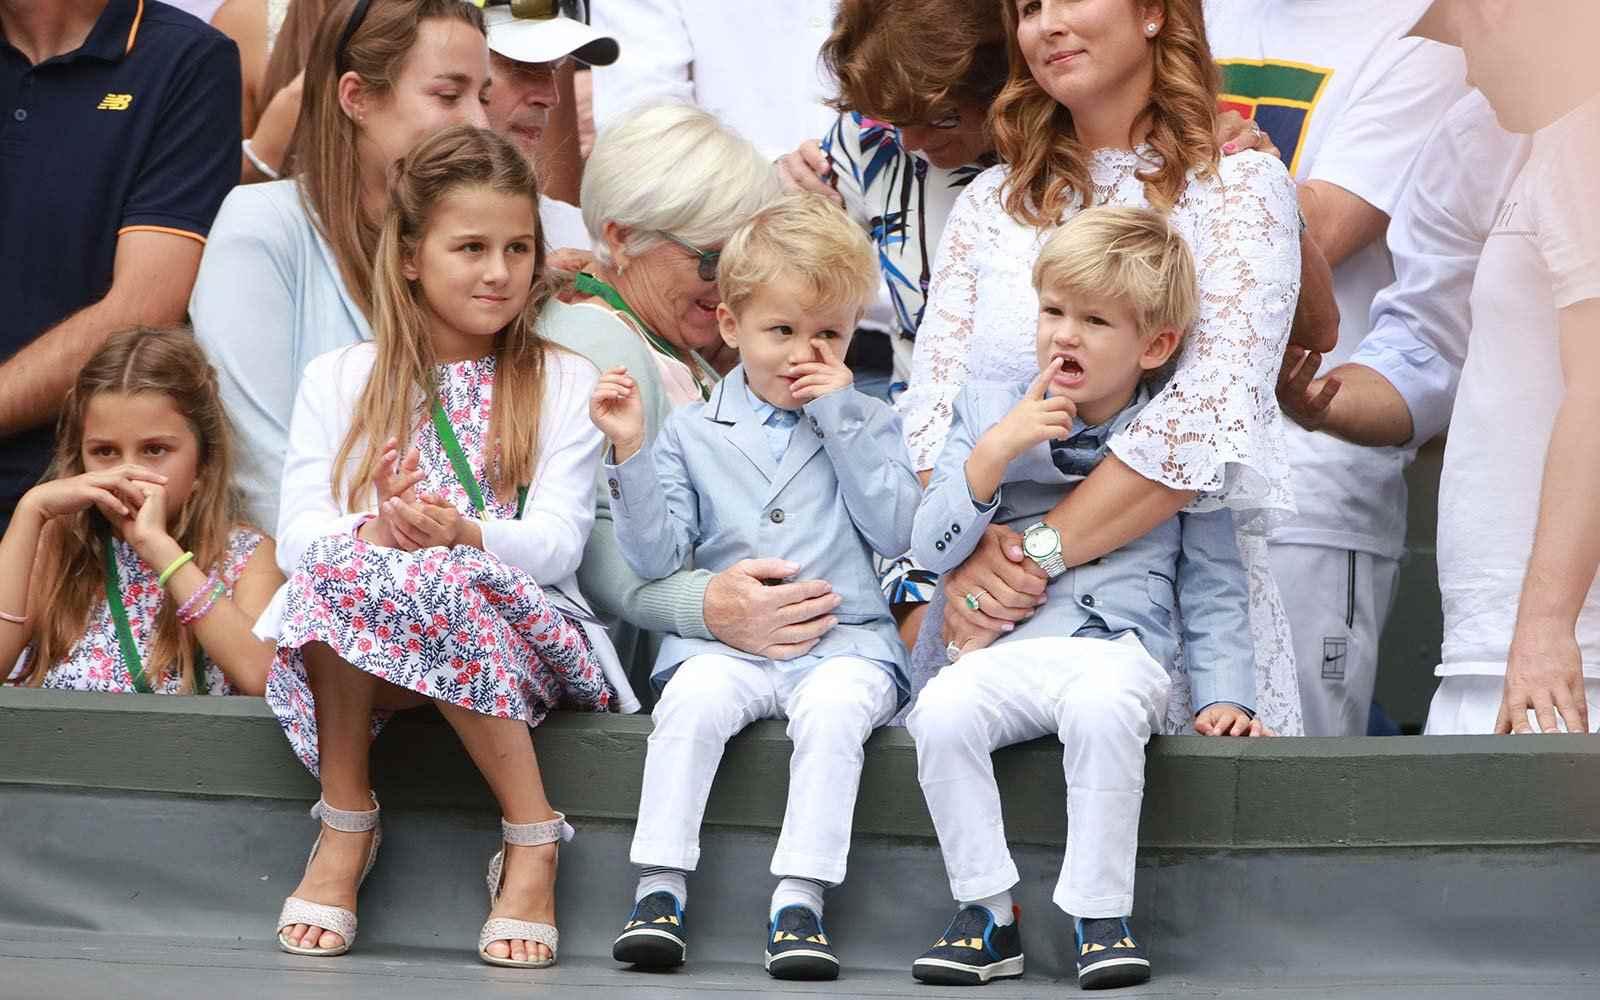 Roger Federer two sets of twins